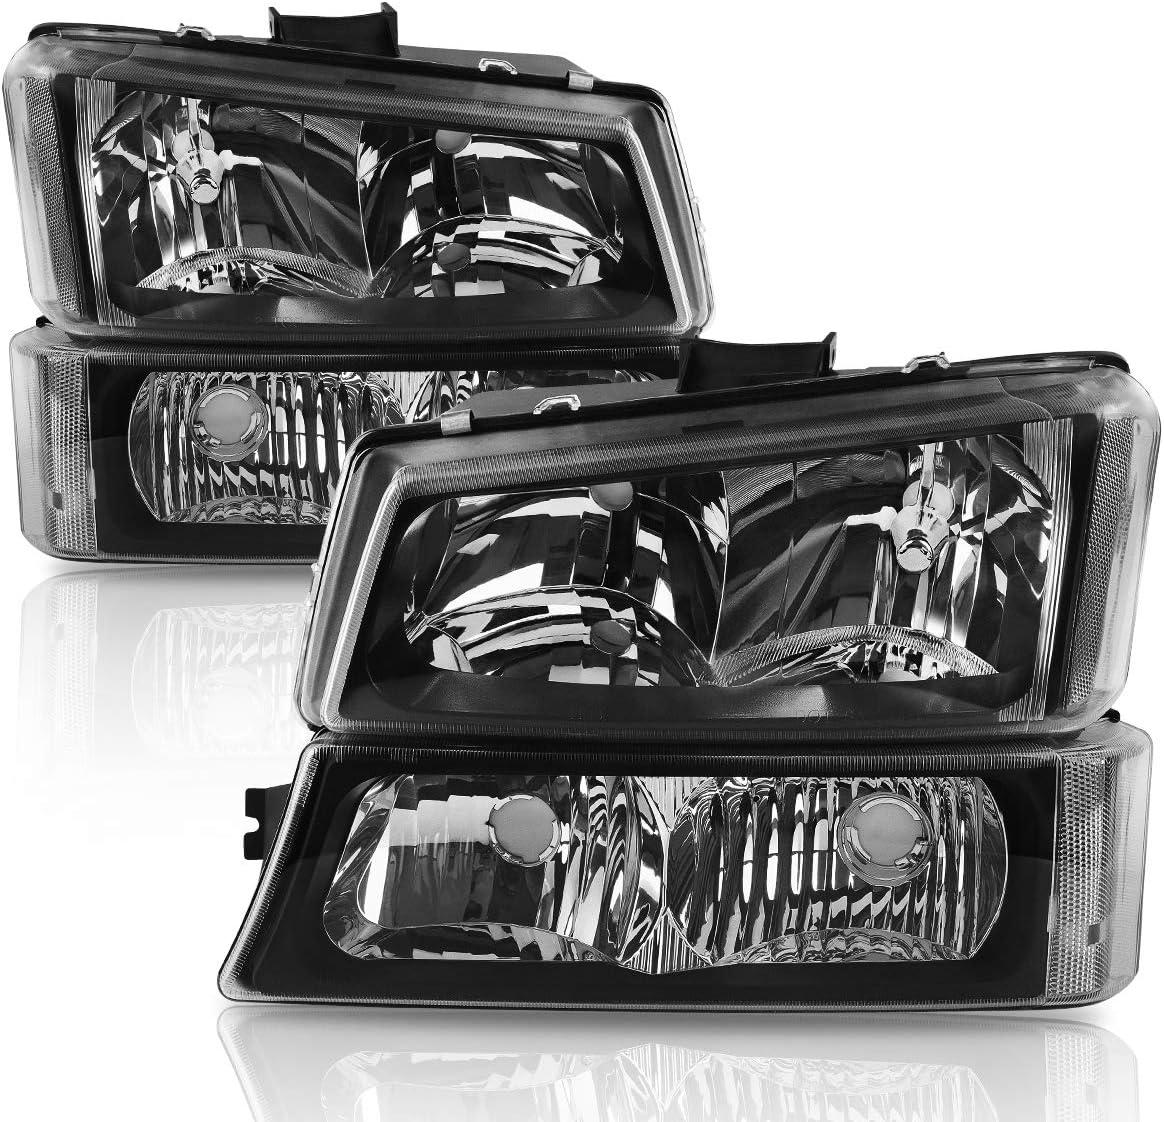 LED Tail Light Fits 2003-2006 Silverado 1500//1500HD// 2500// 2500HD// 3500 2007 Classic Black Smoke Headlight Bumper Lamp